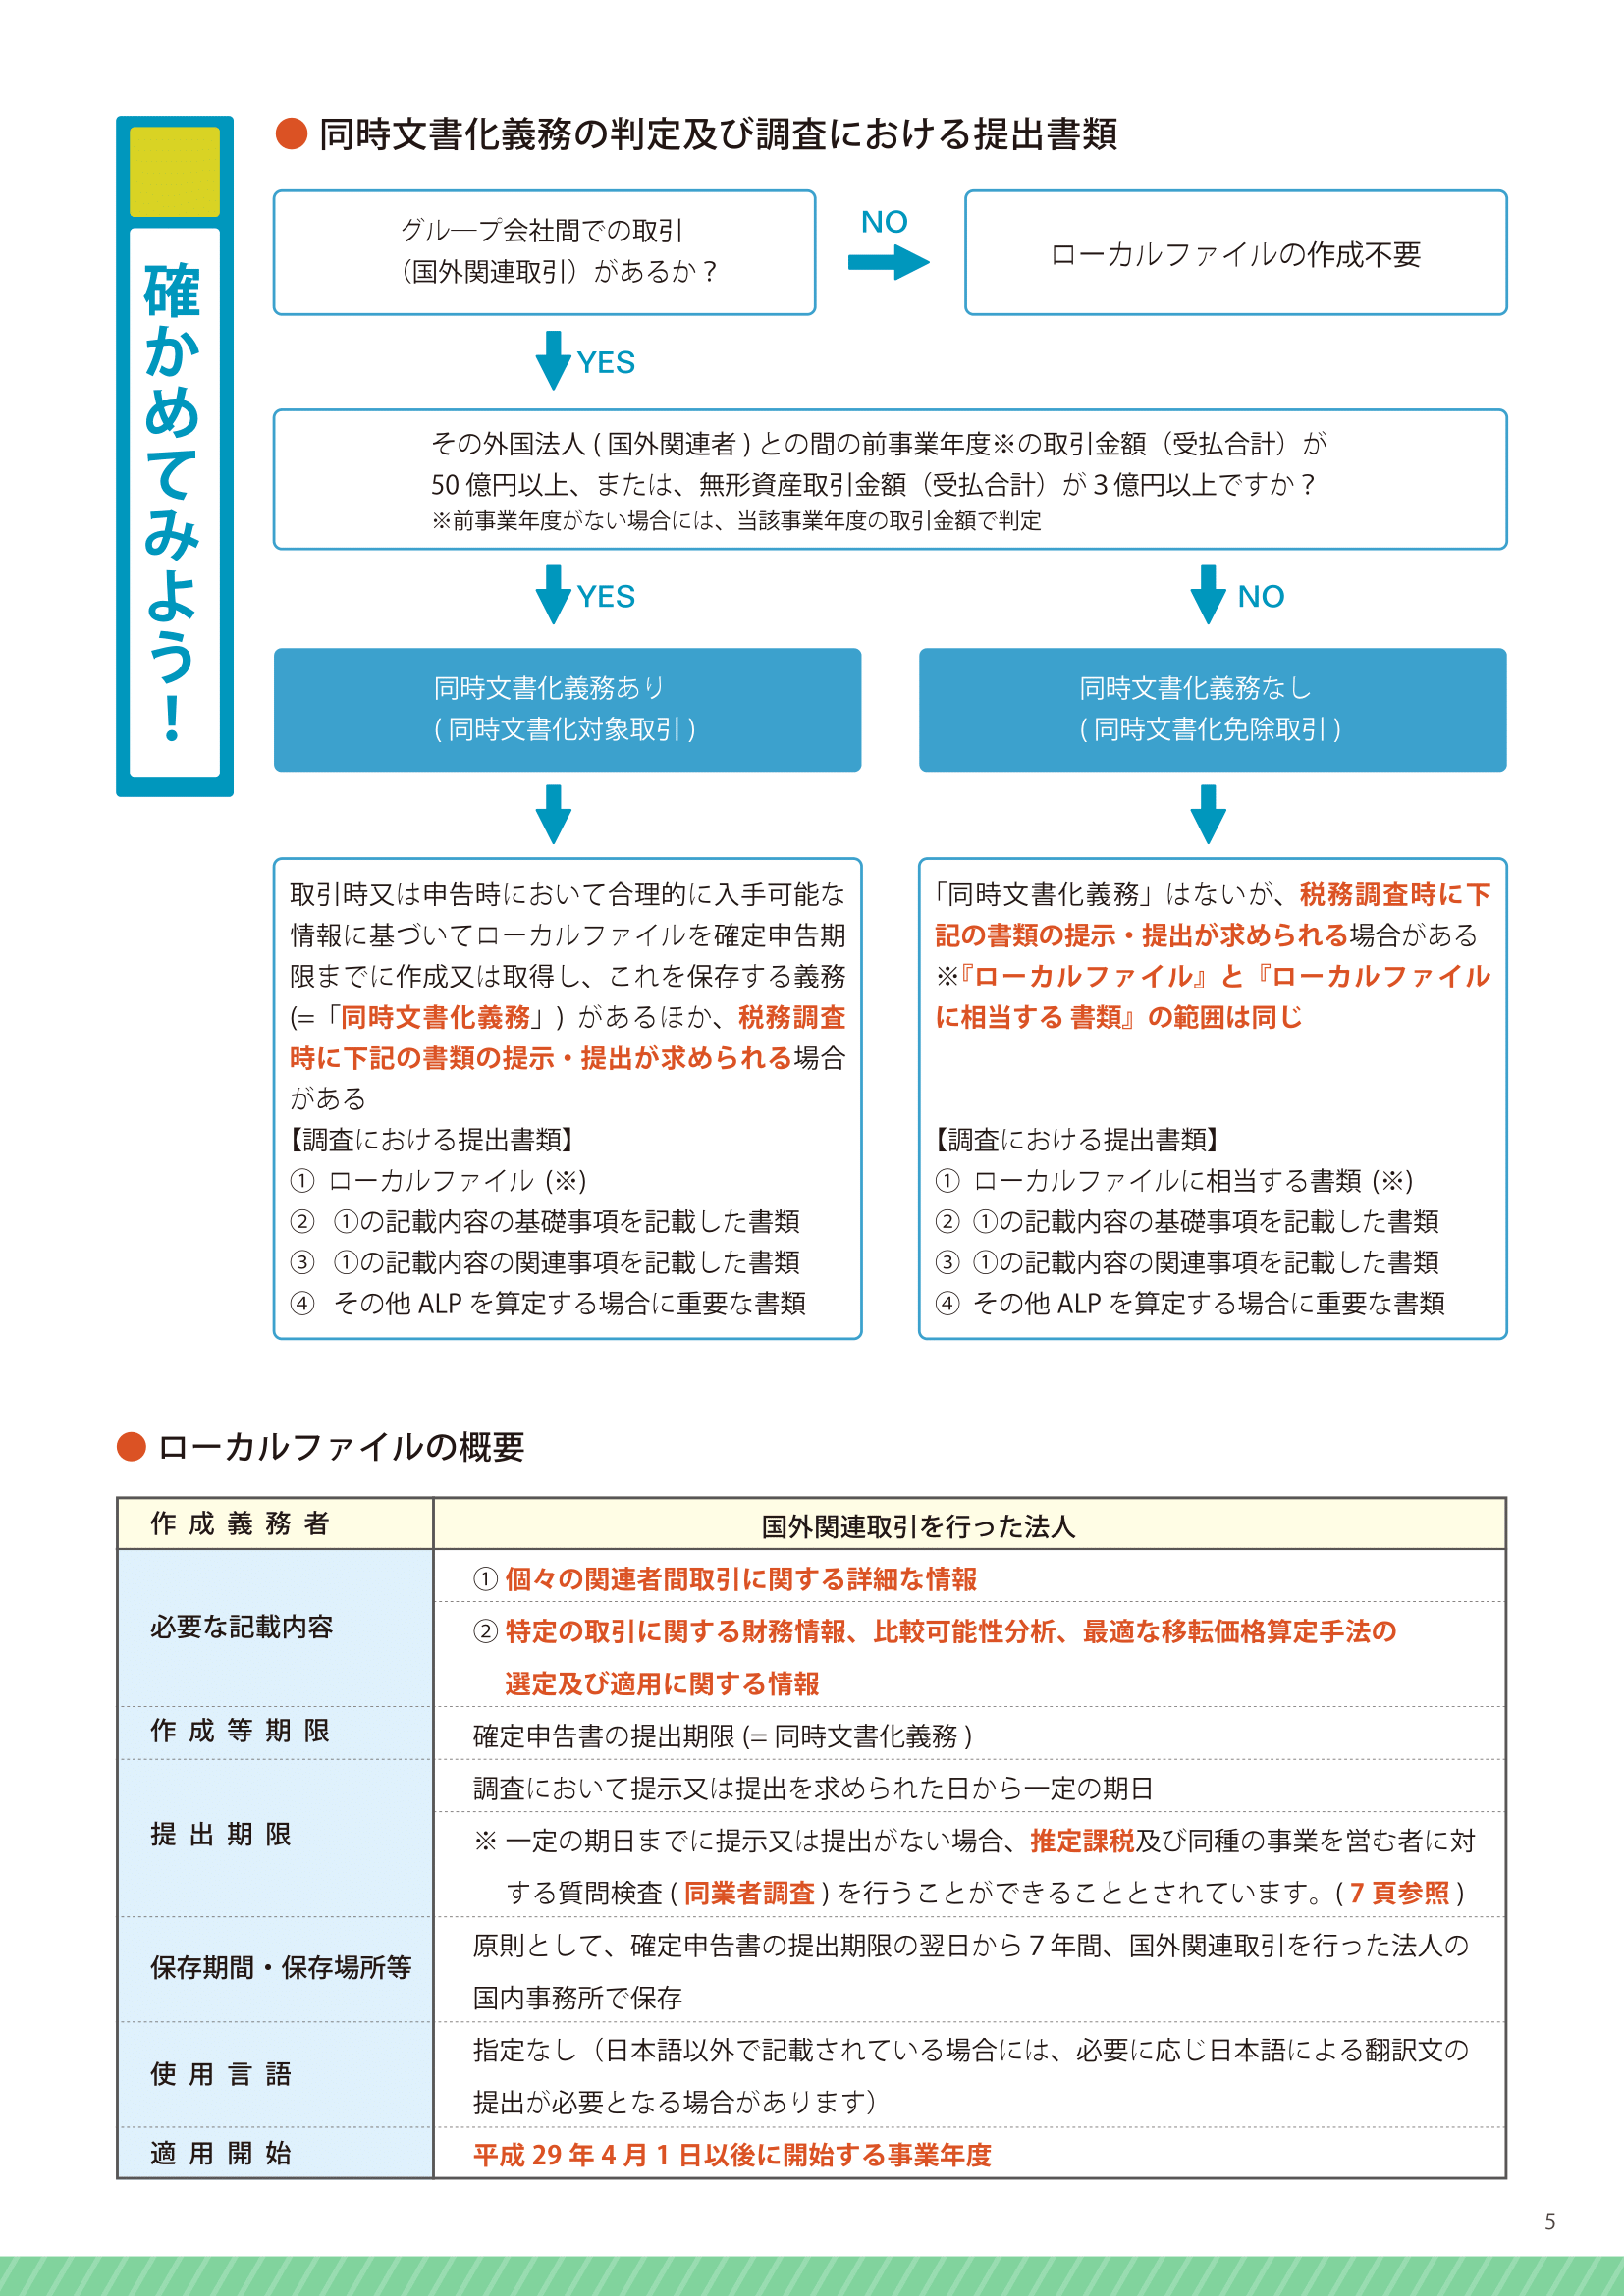 tpinfo_gaiyou-07